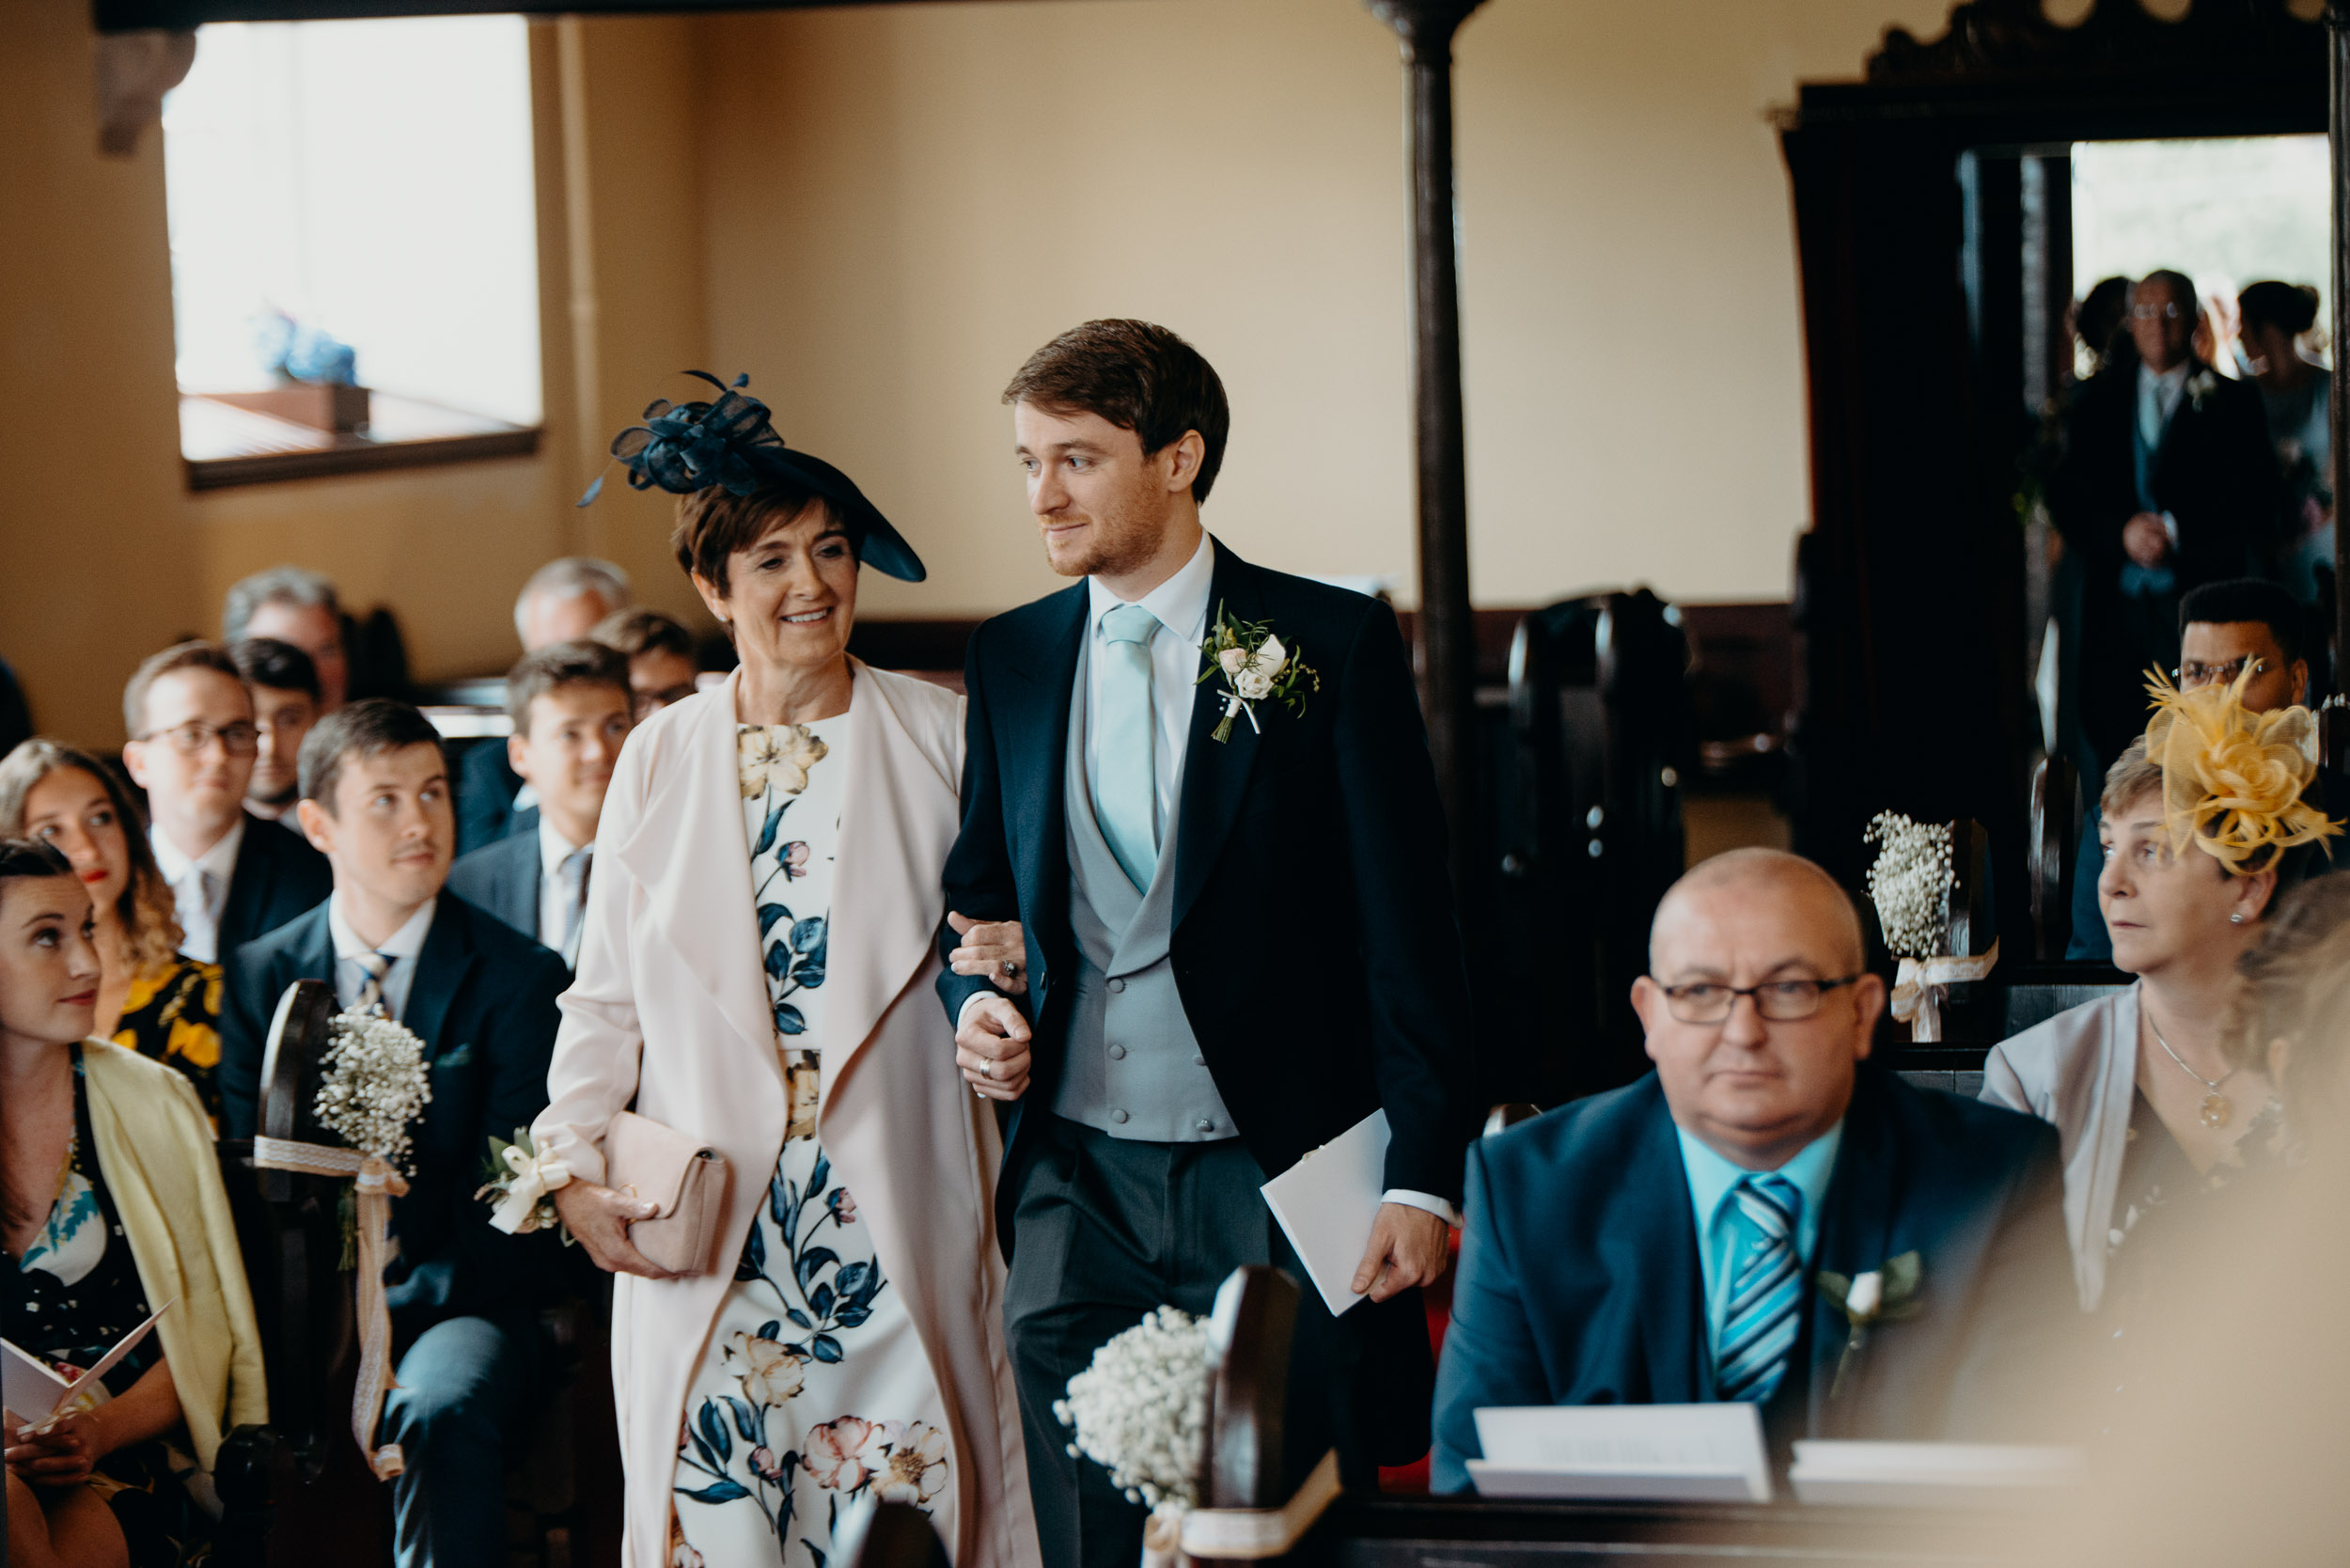 drenagh estate wedding photography-44.jpg